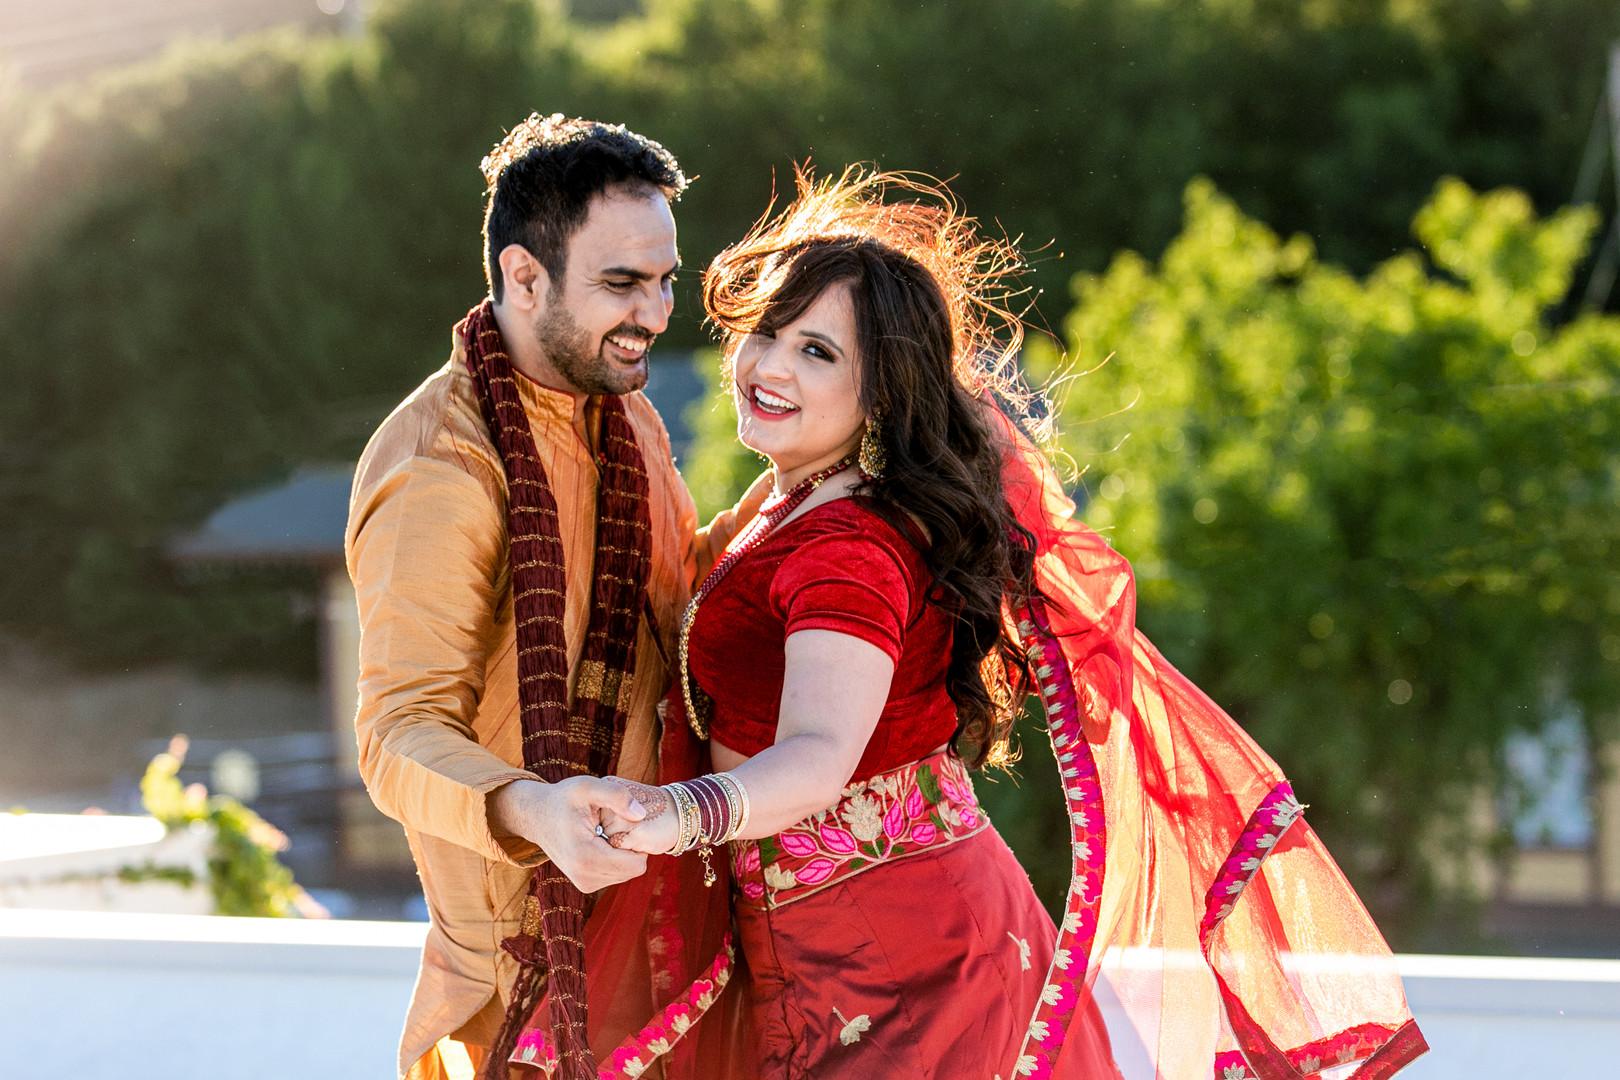 Tasleen&Vaibhav-Romance-036-1293.jpg